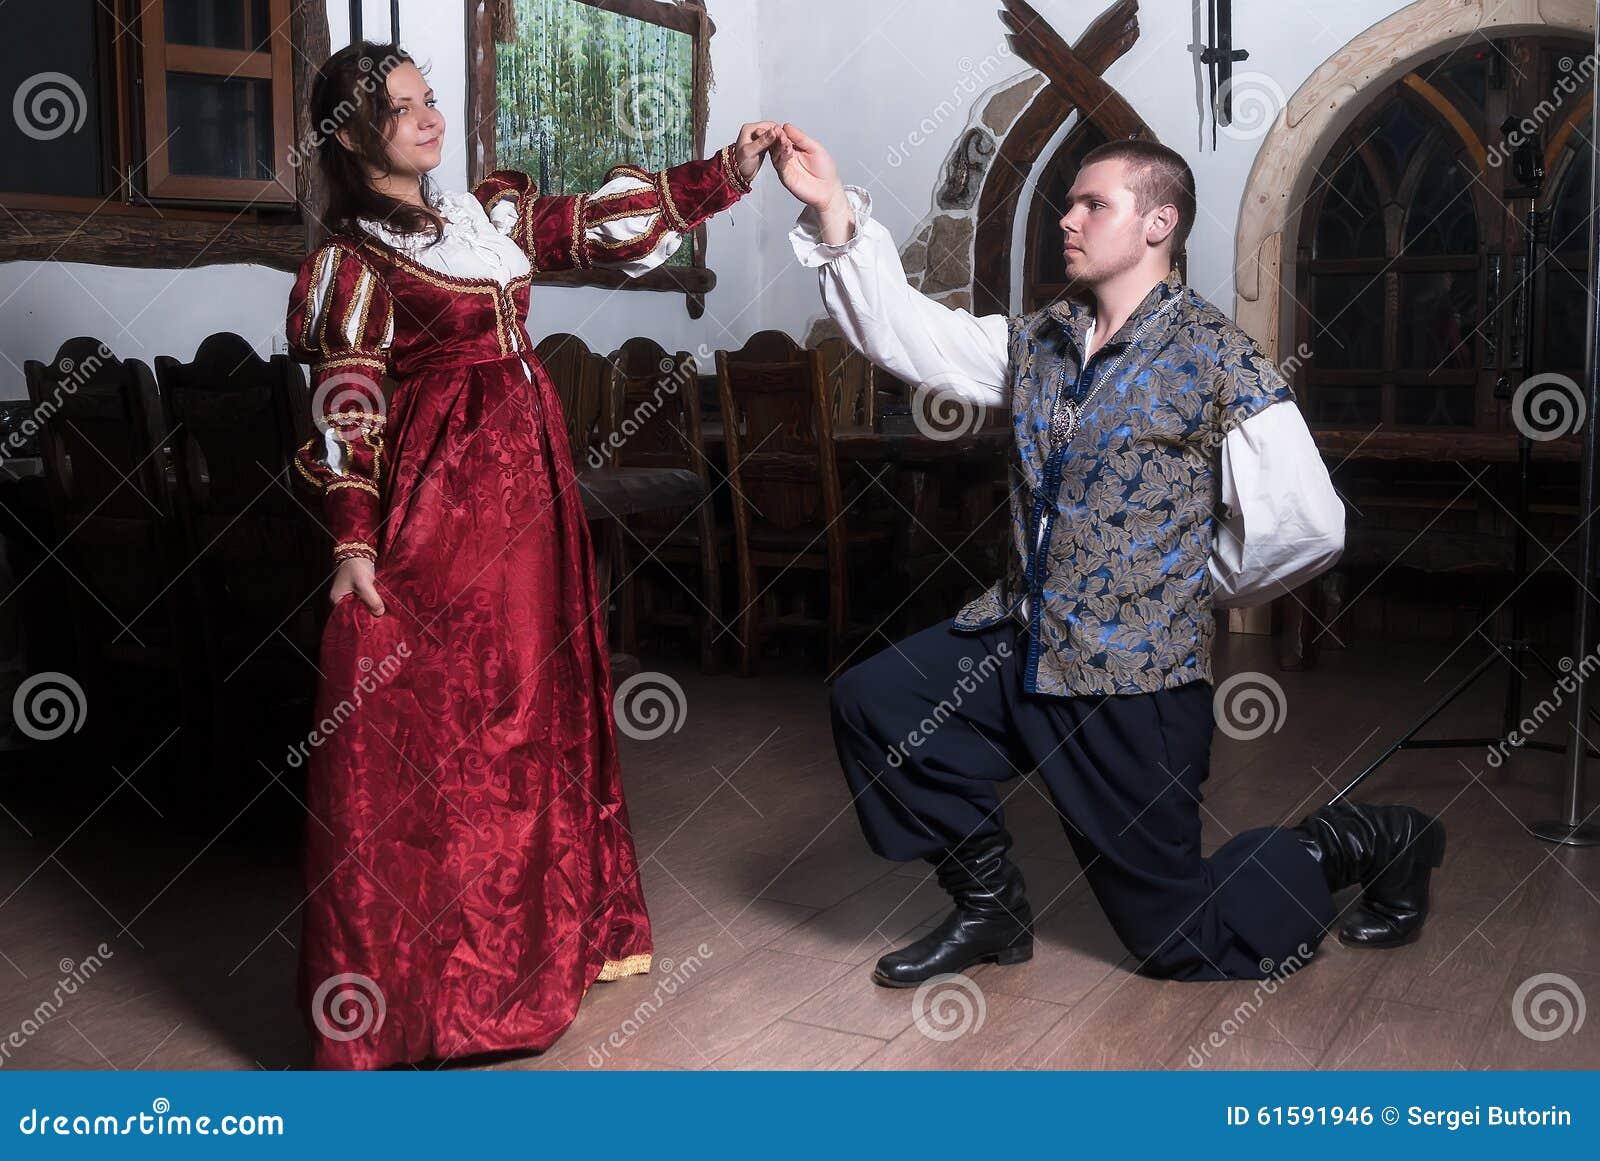 767b4ef81f17 Attractive Couple In Retro Dresses Dance Stock Photo - Image of ...